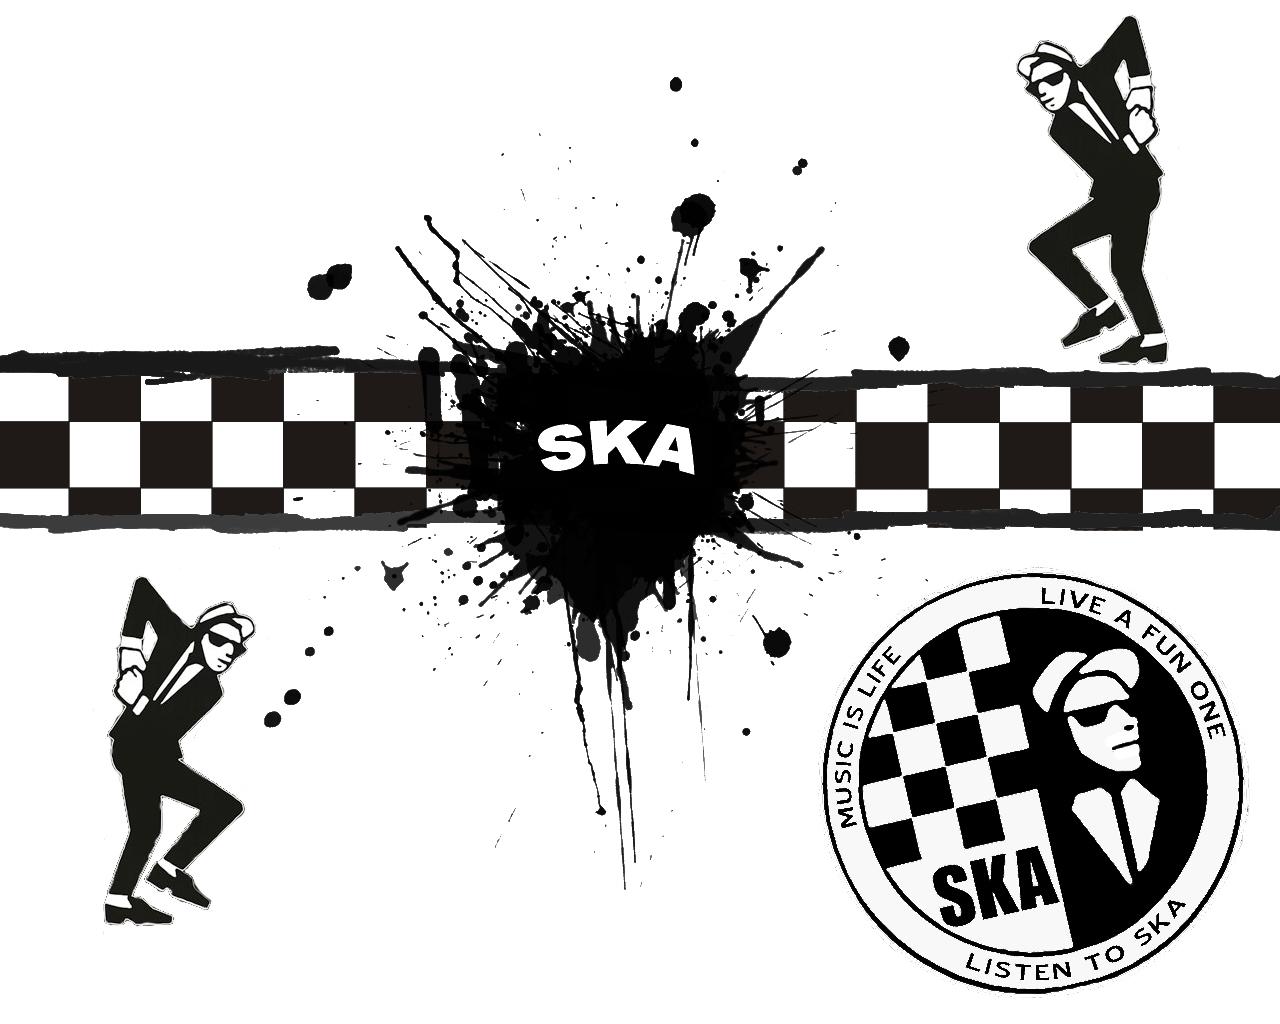 Ska by aprologuetothechaos on DeviantArt